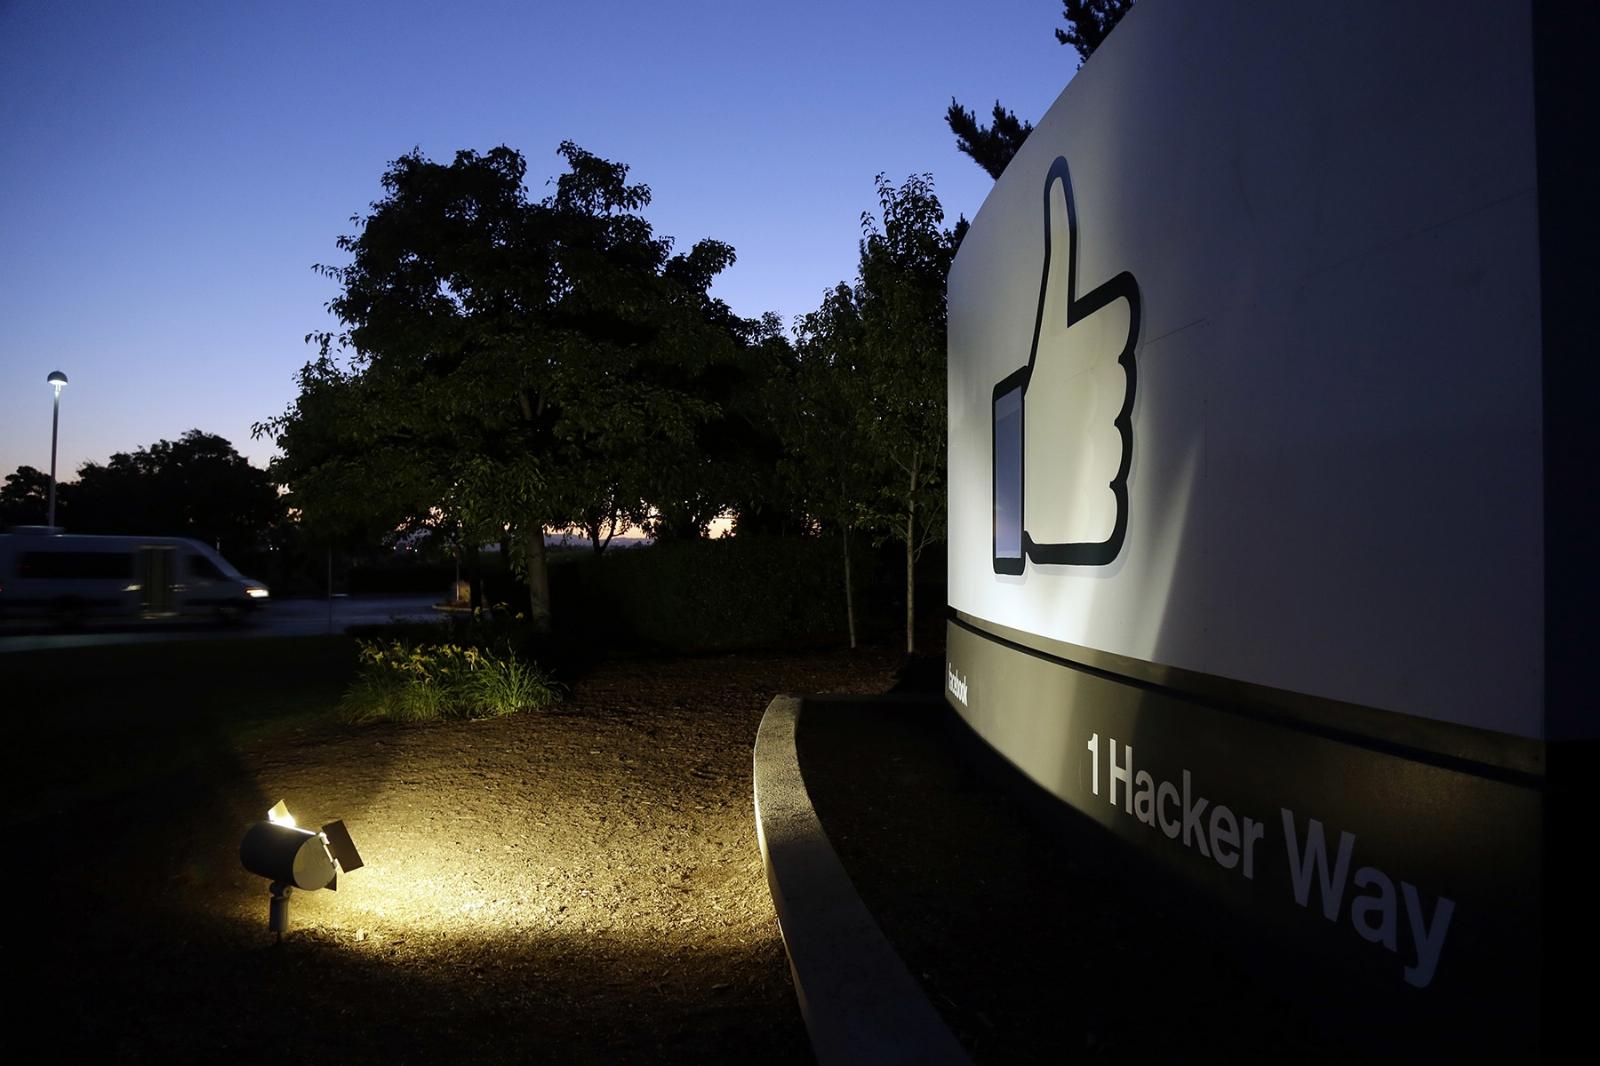 Investigan a compañía británica acusada de filtrar datos de Facebook